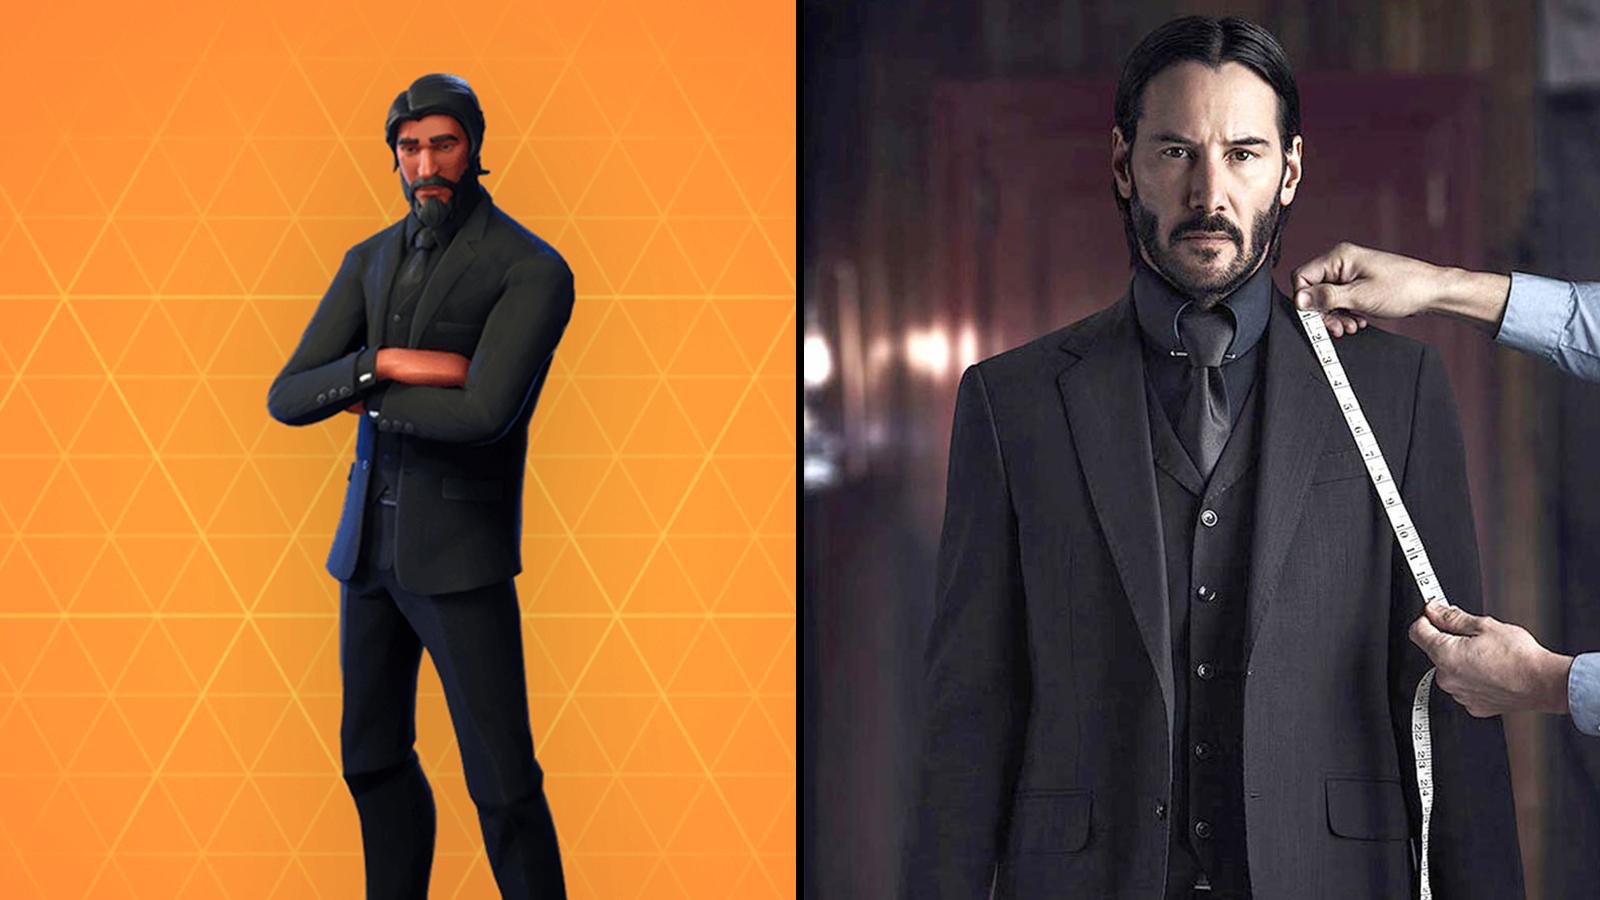 Epic Games / Summit Entertainment